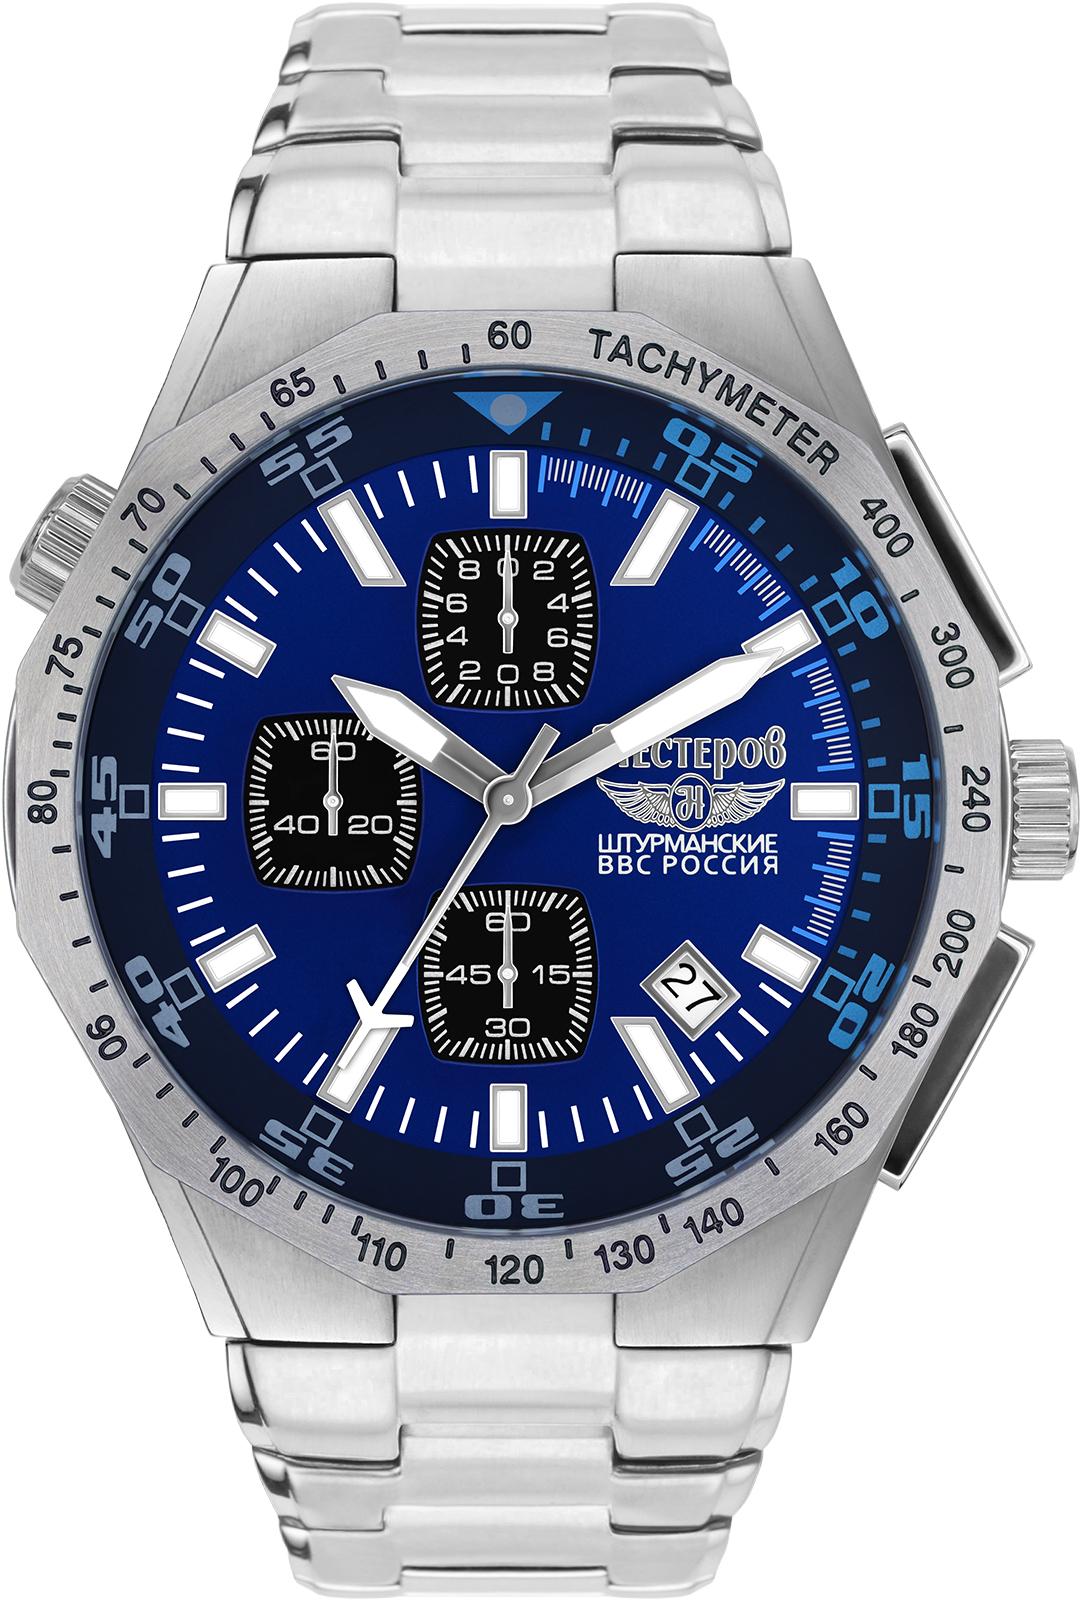 Часы Нестеров H0513B02-74DB все цены